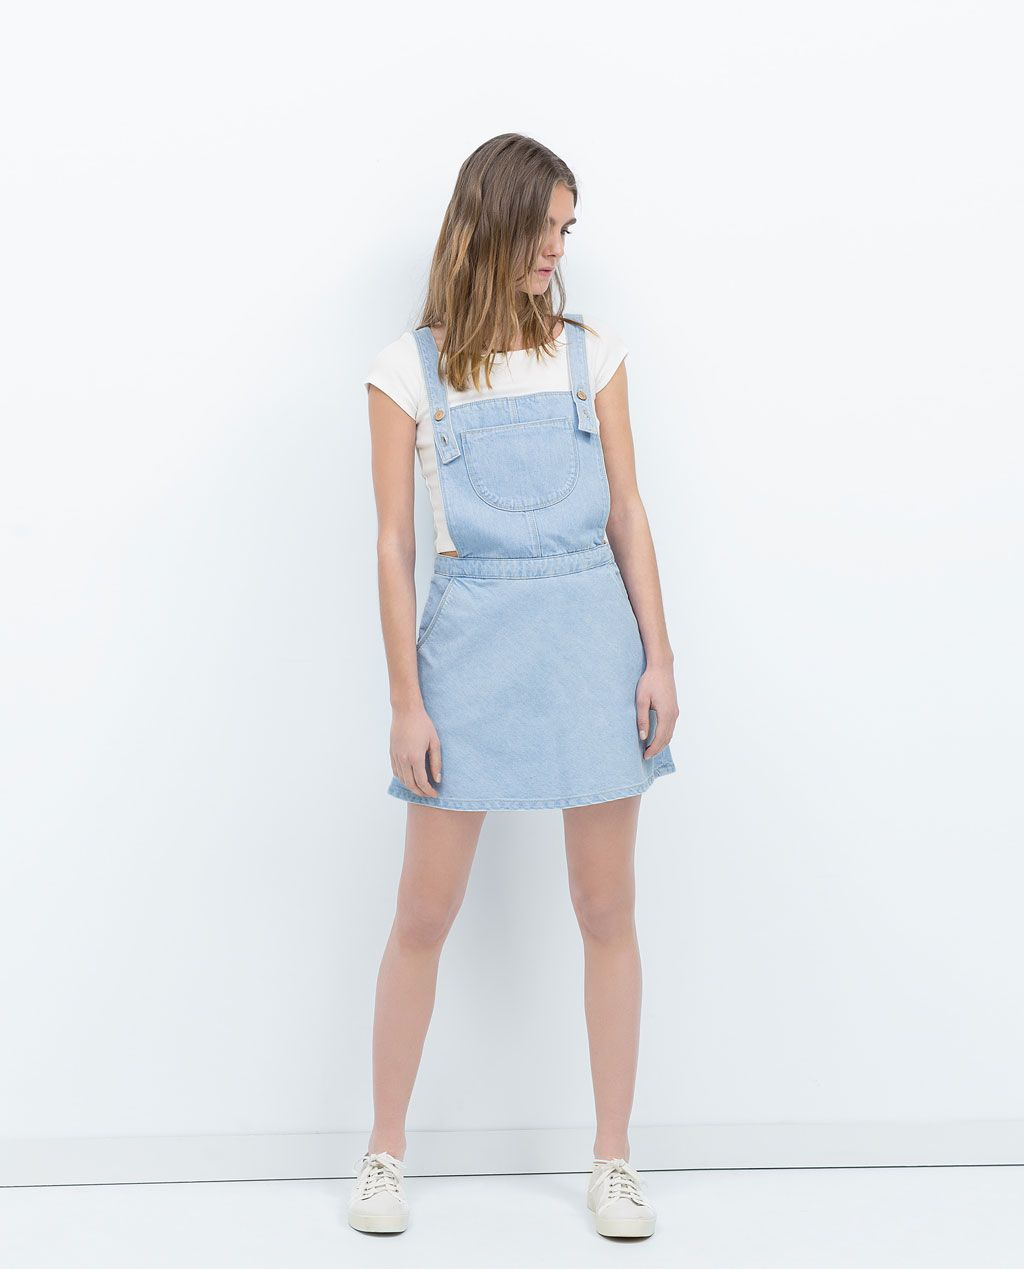 0a84dc6a13a65c Image 1 de JUPE SALOPETTE de Zara   J e a n s   Salopette jupe ...